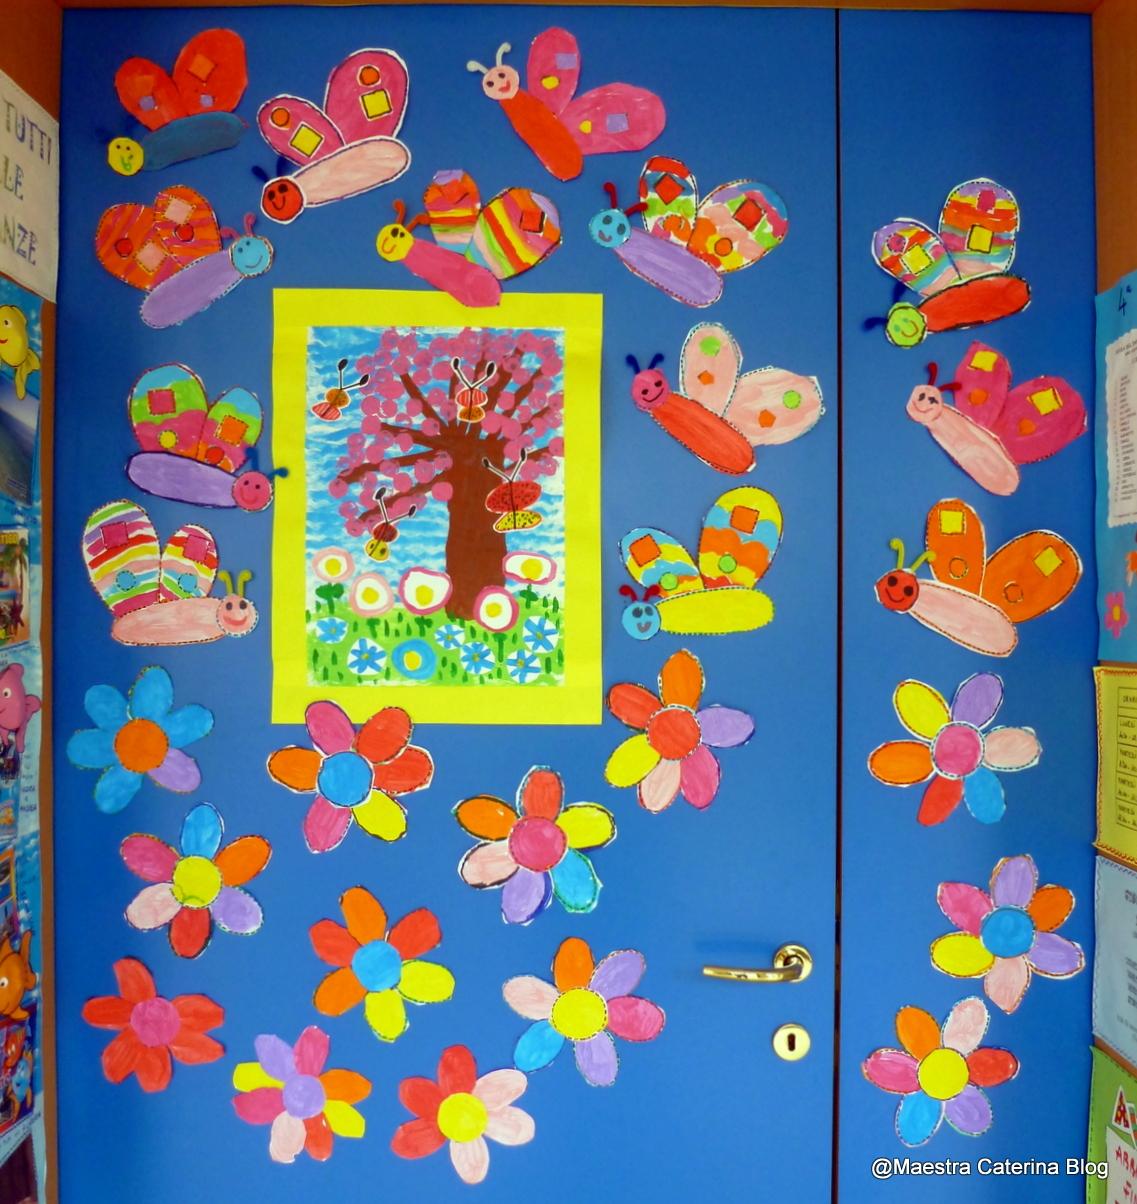 Maestra caterina porta di primavera for Addobbi di carnevale per l aula